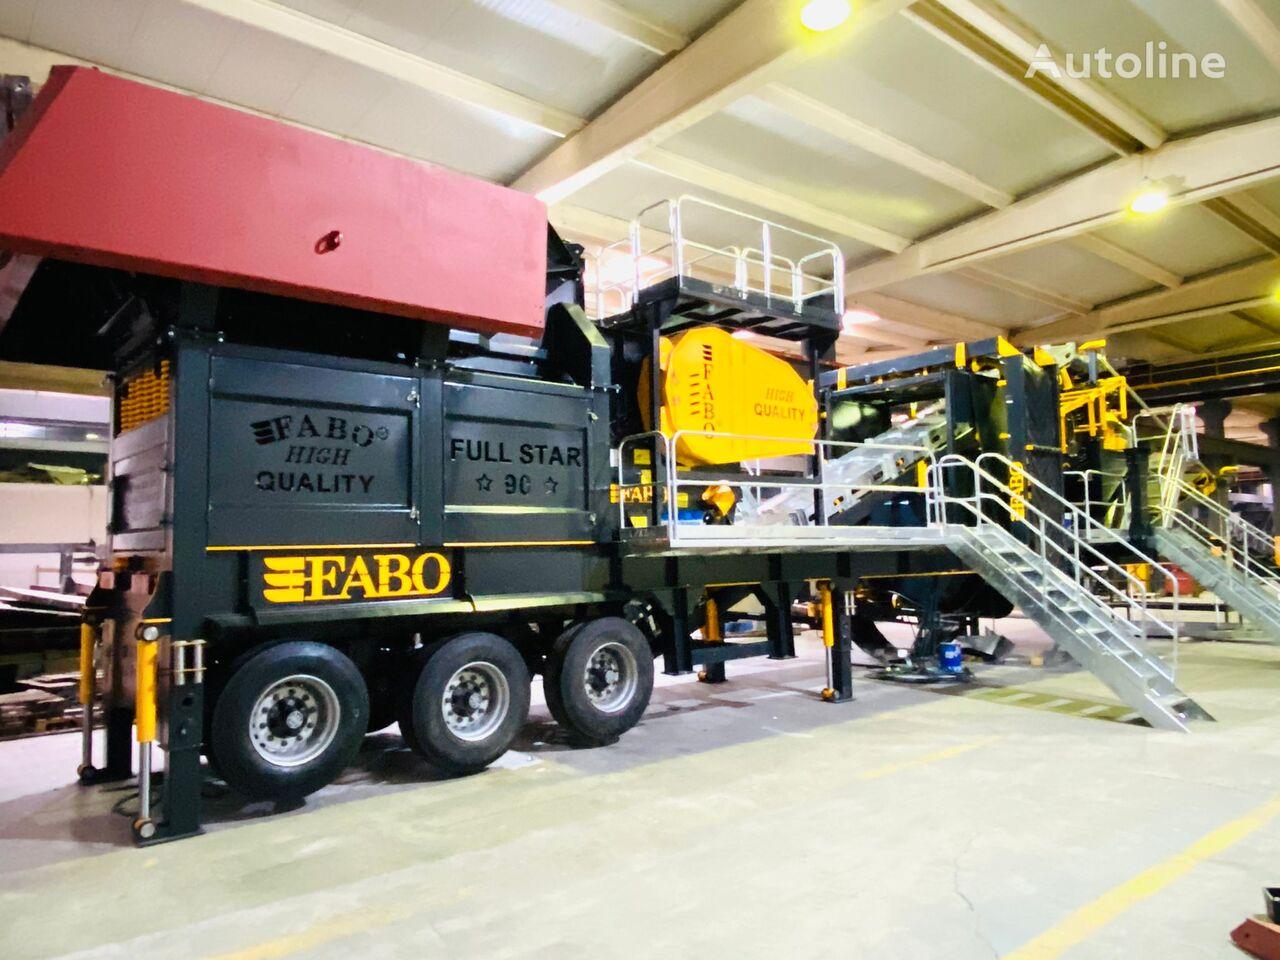 новая дробильная установка Fabo FULLSTAR 90 Crushing, Washing And Screening  Plant